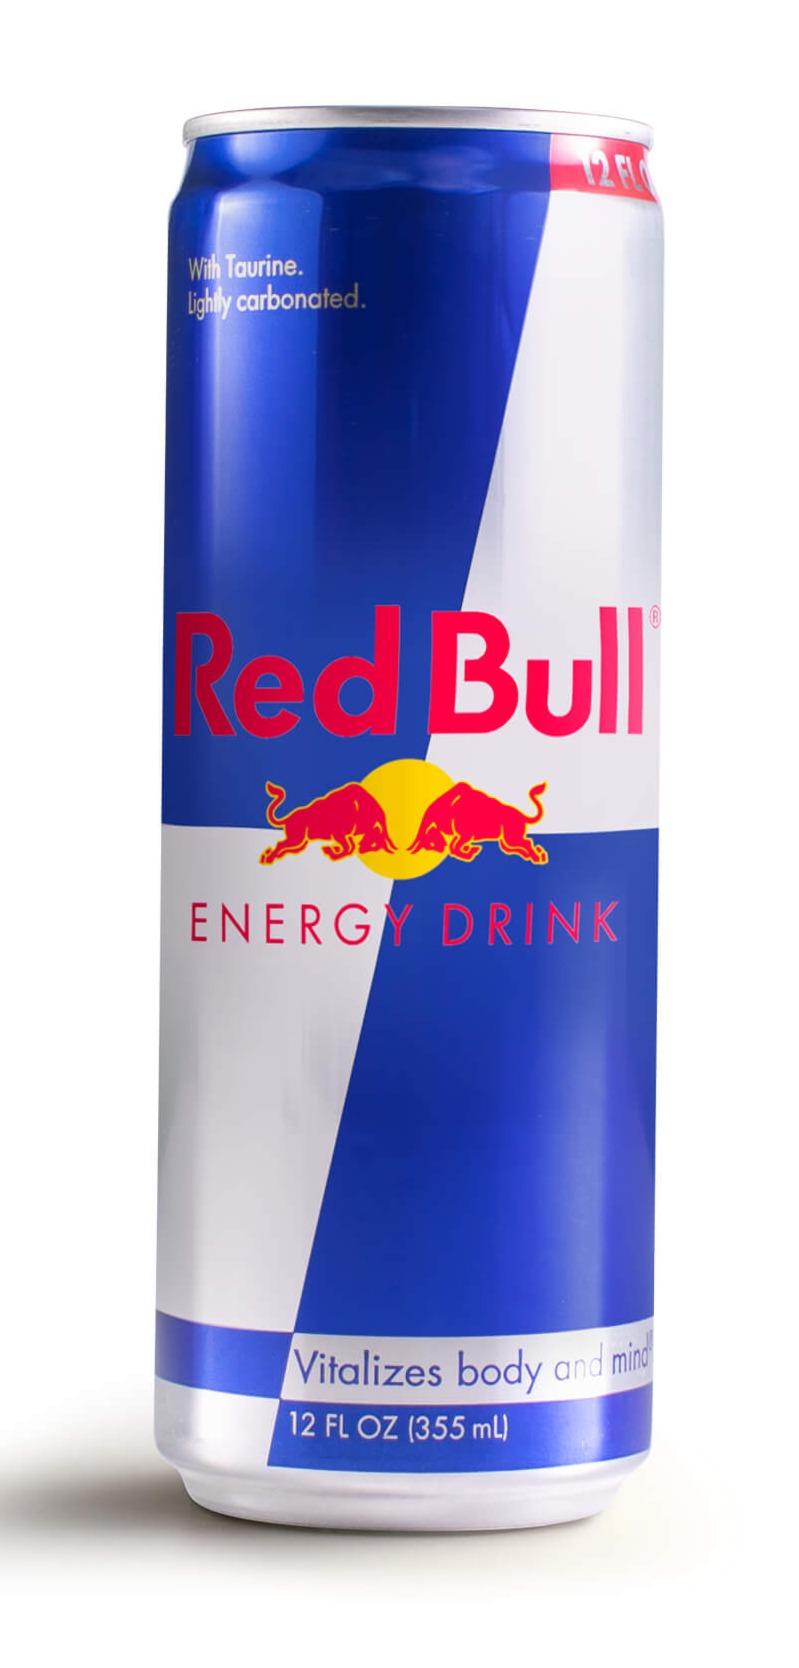 Red Bull Image